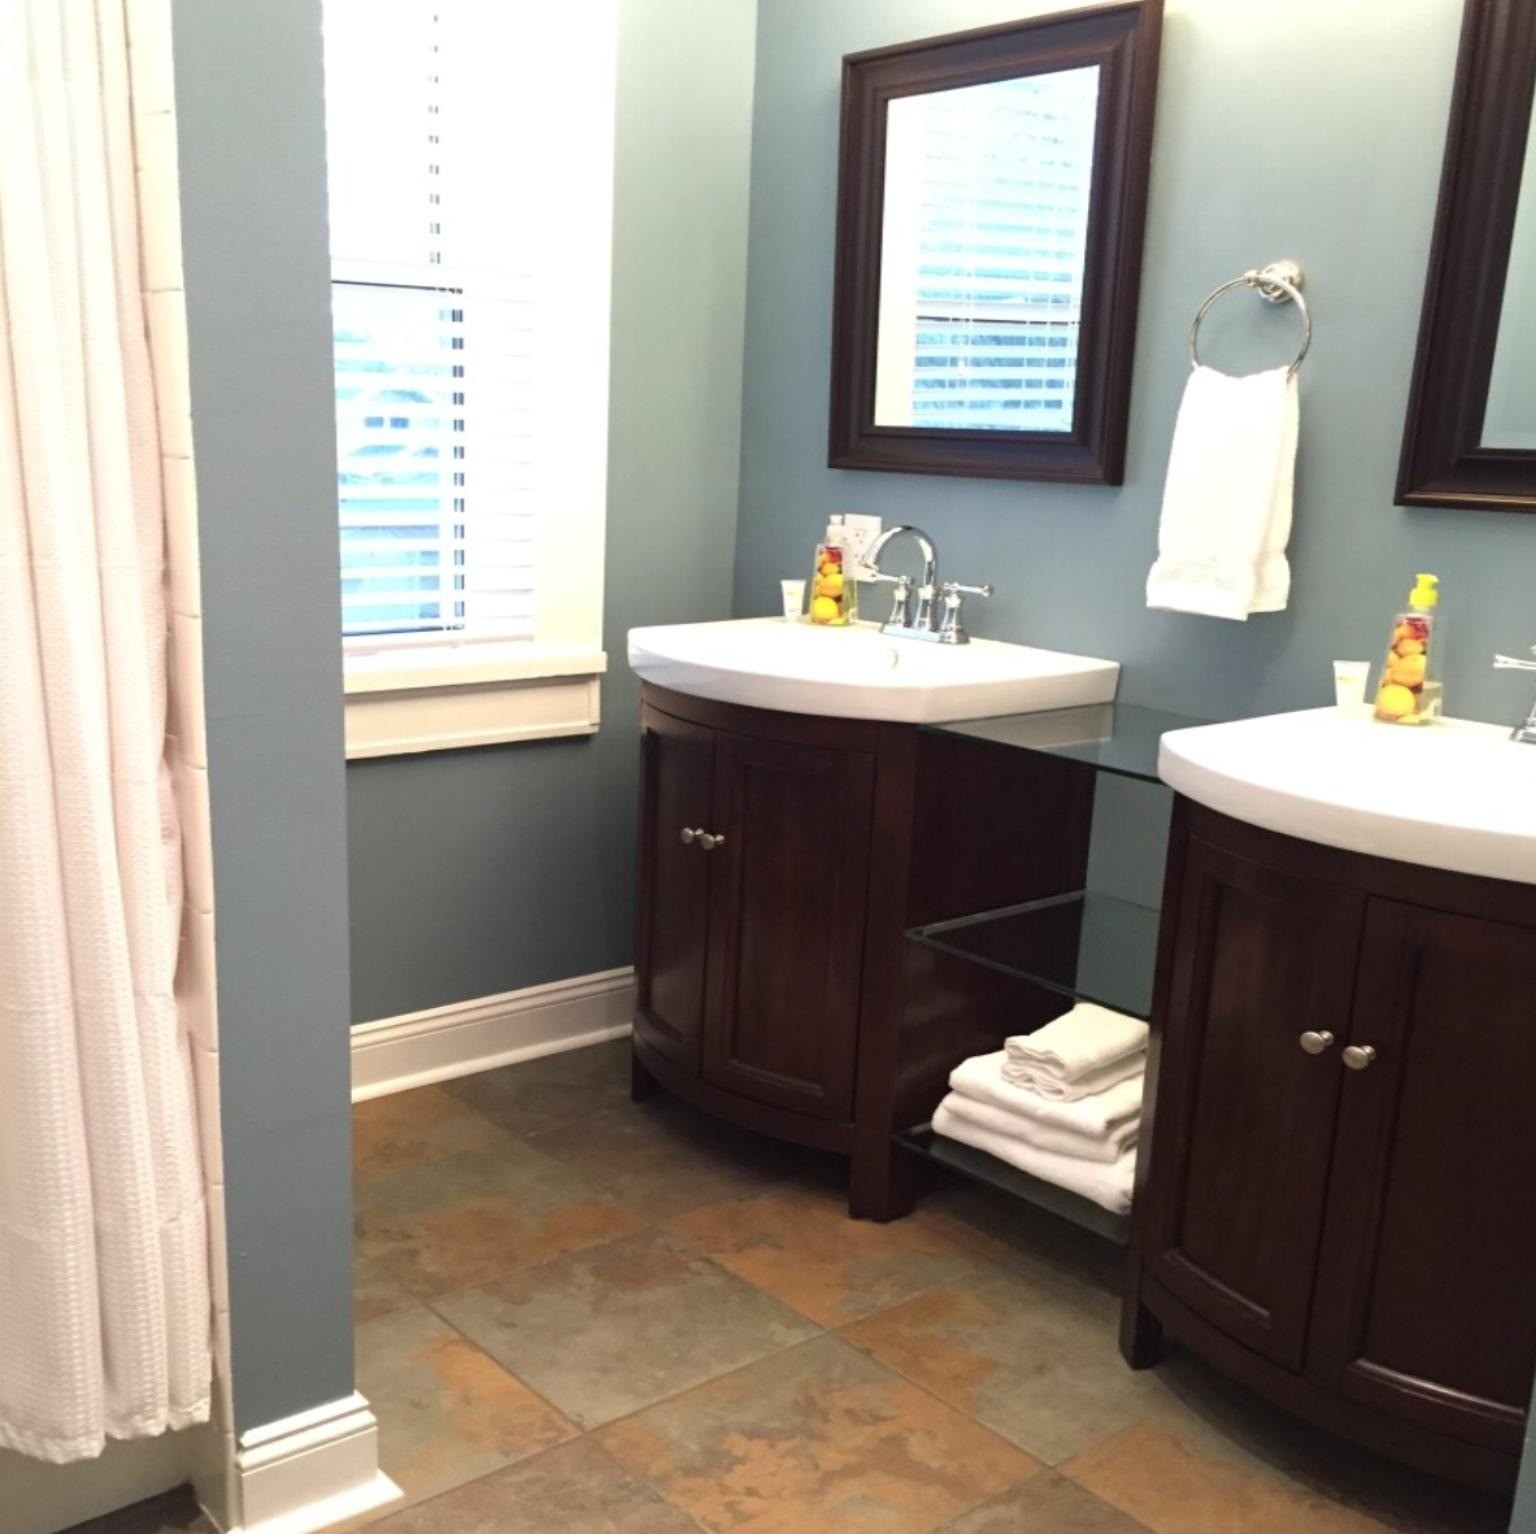 Heated Bathroom Tile: The Fireside Suite